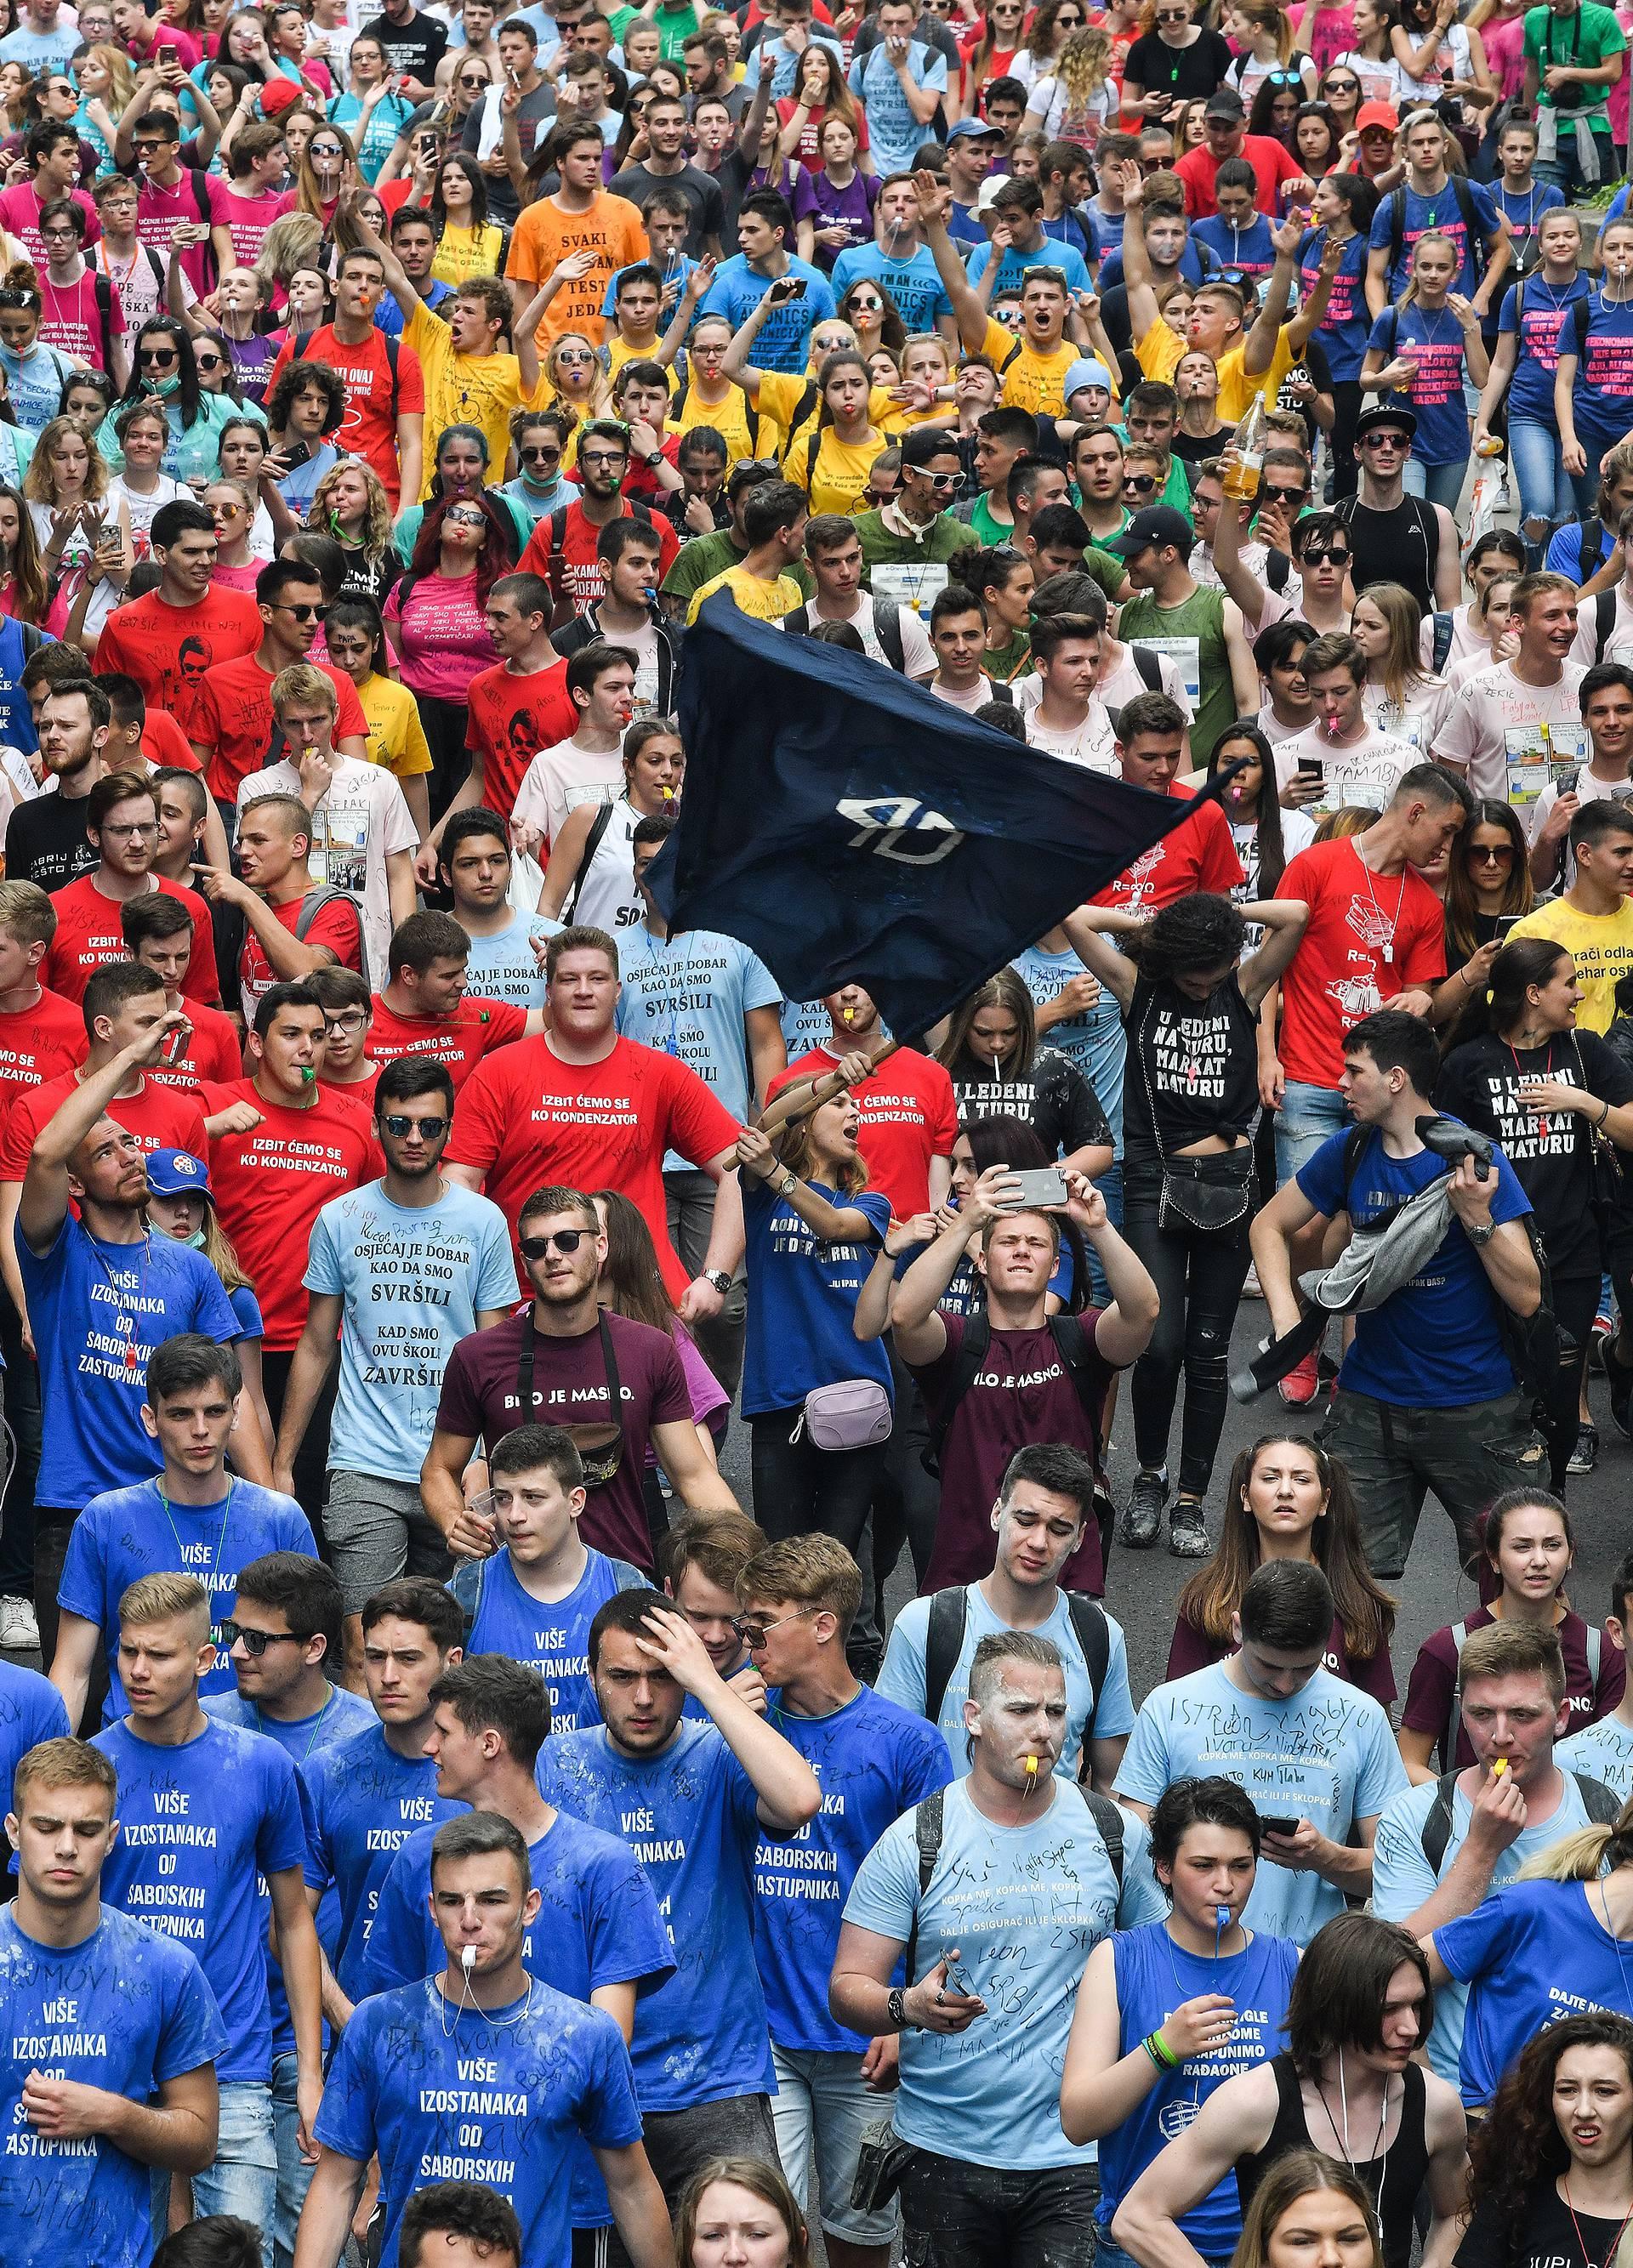 Egzodus: Svaki drugi maturant vidi budućnost izvan Hrvatske